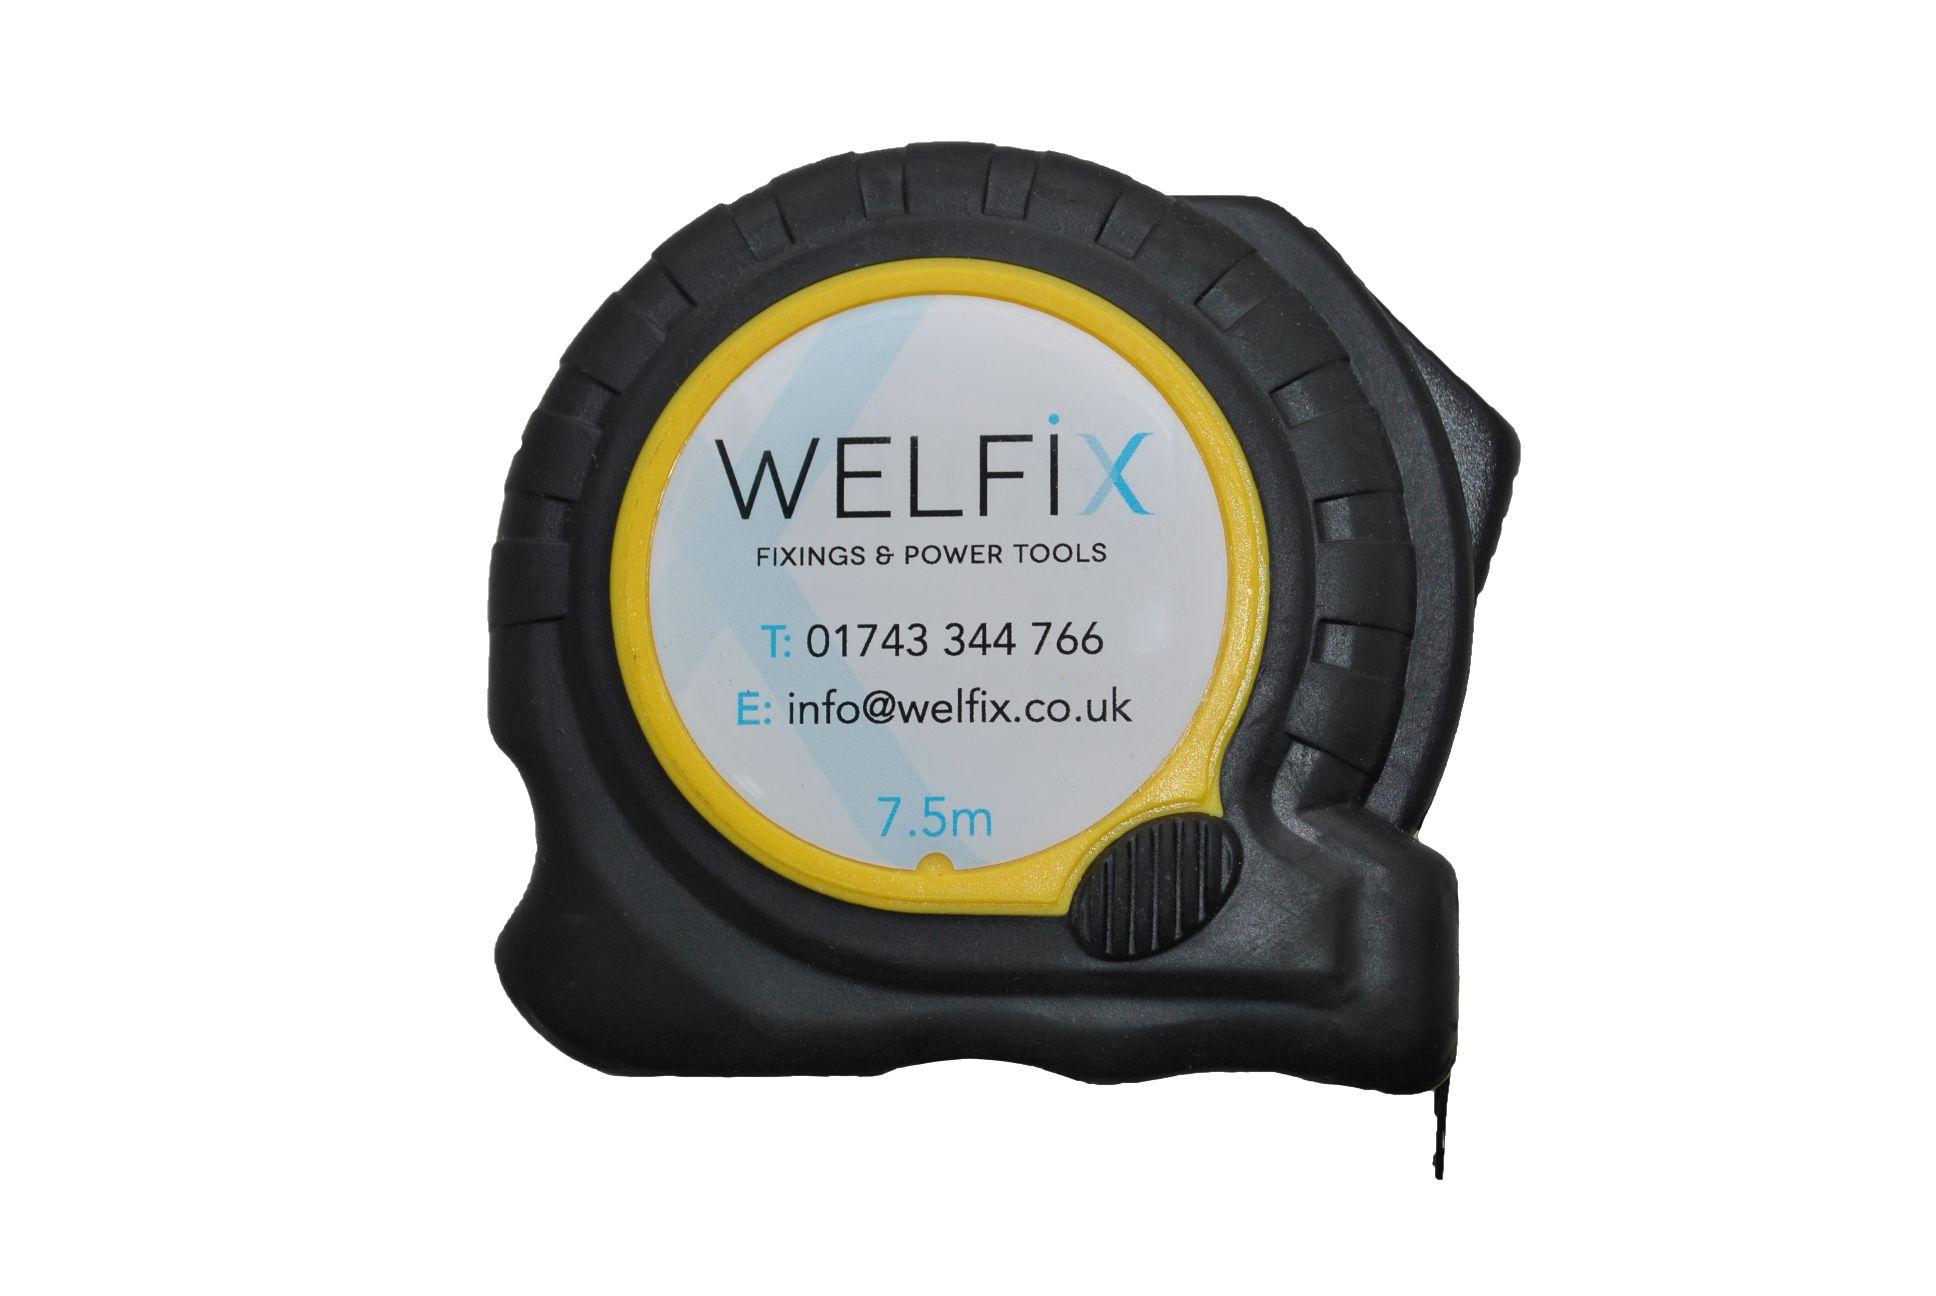 'WELFIX' TAPE MEASURE -  5M/16FT